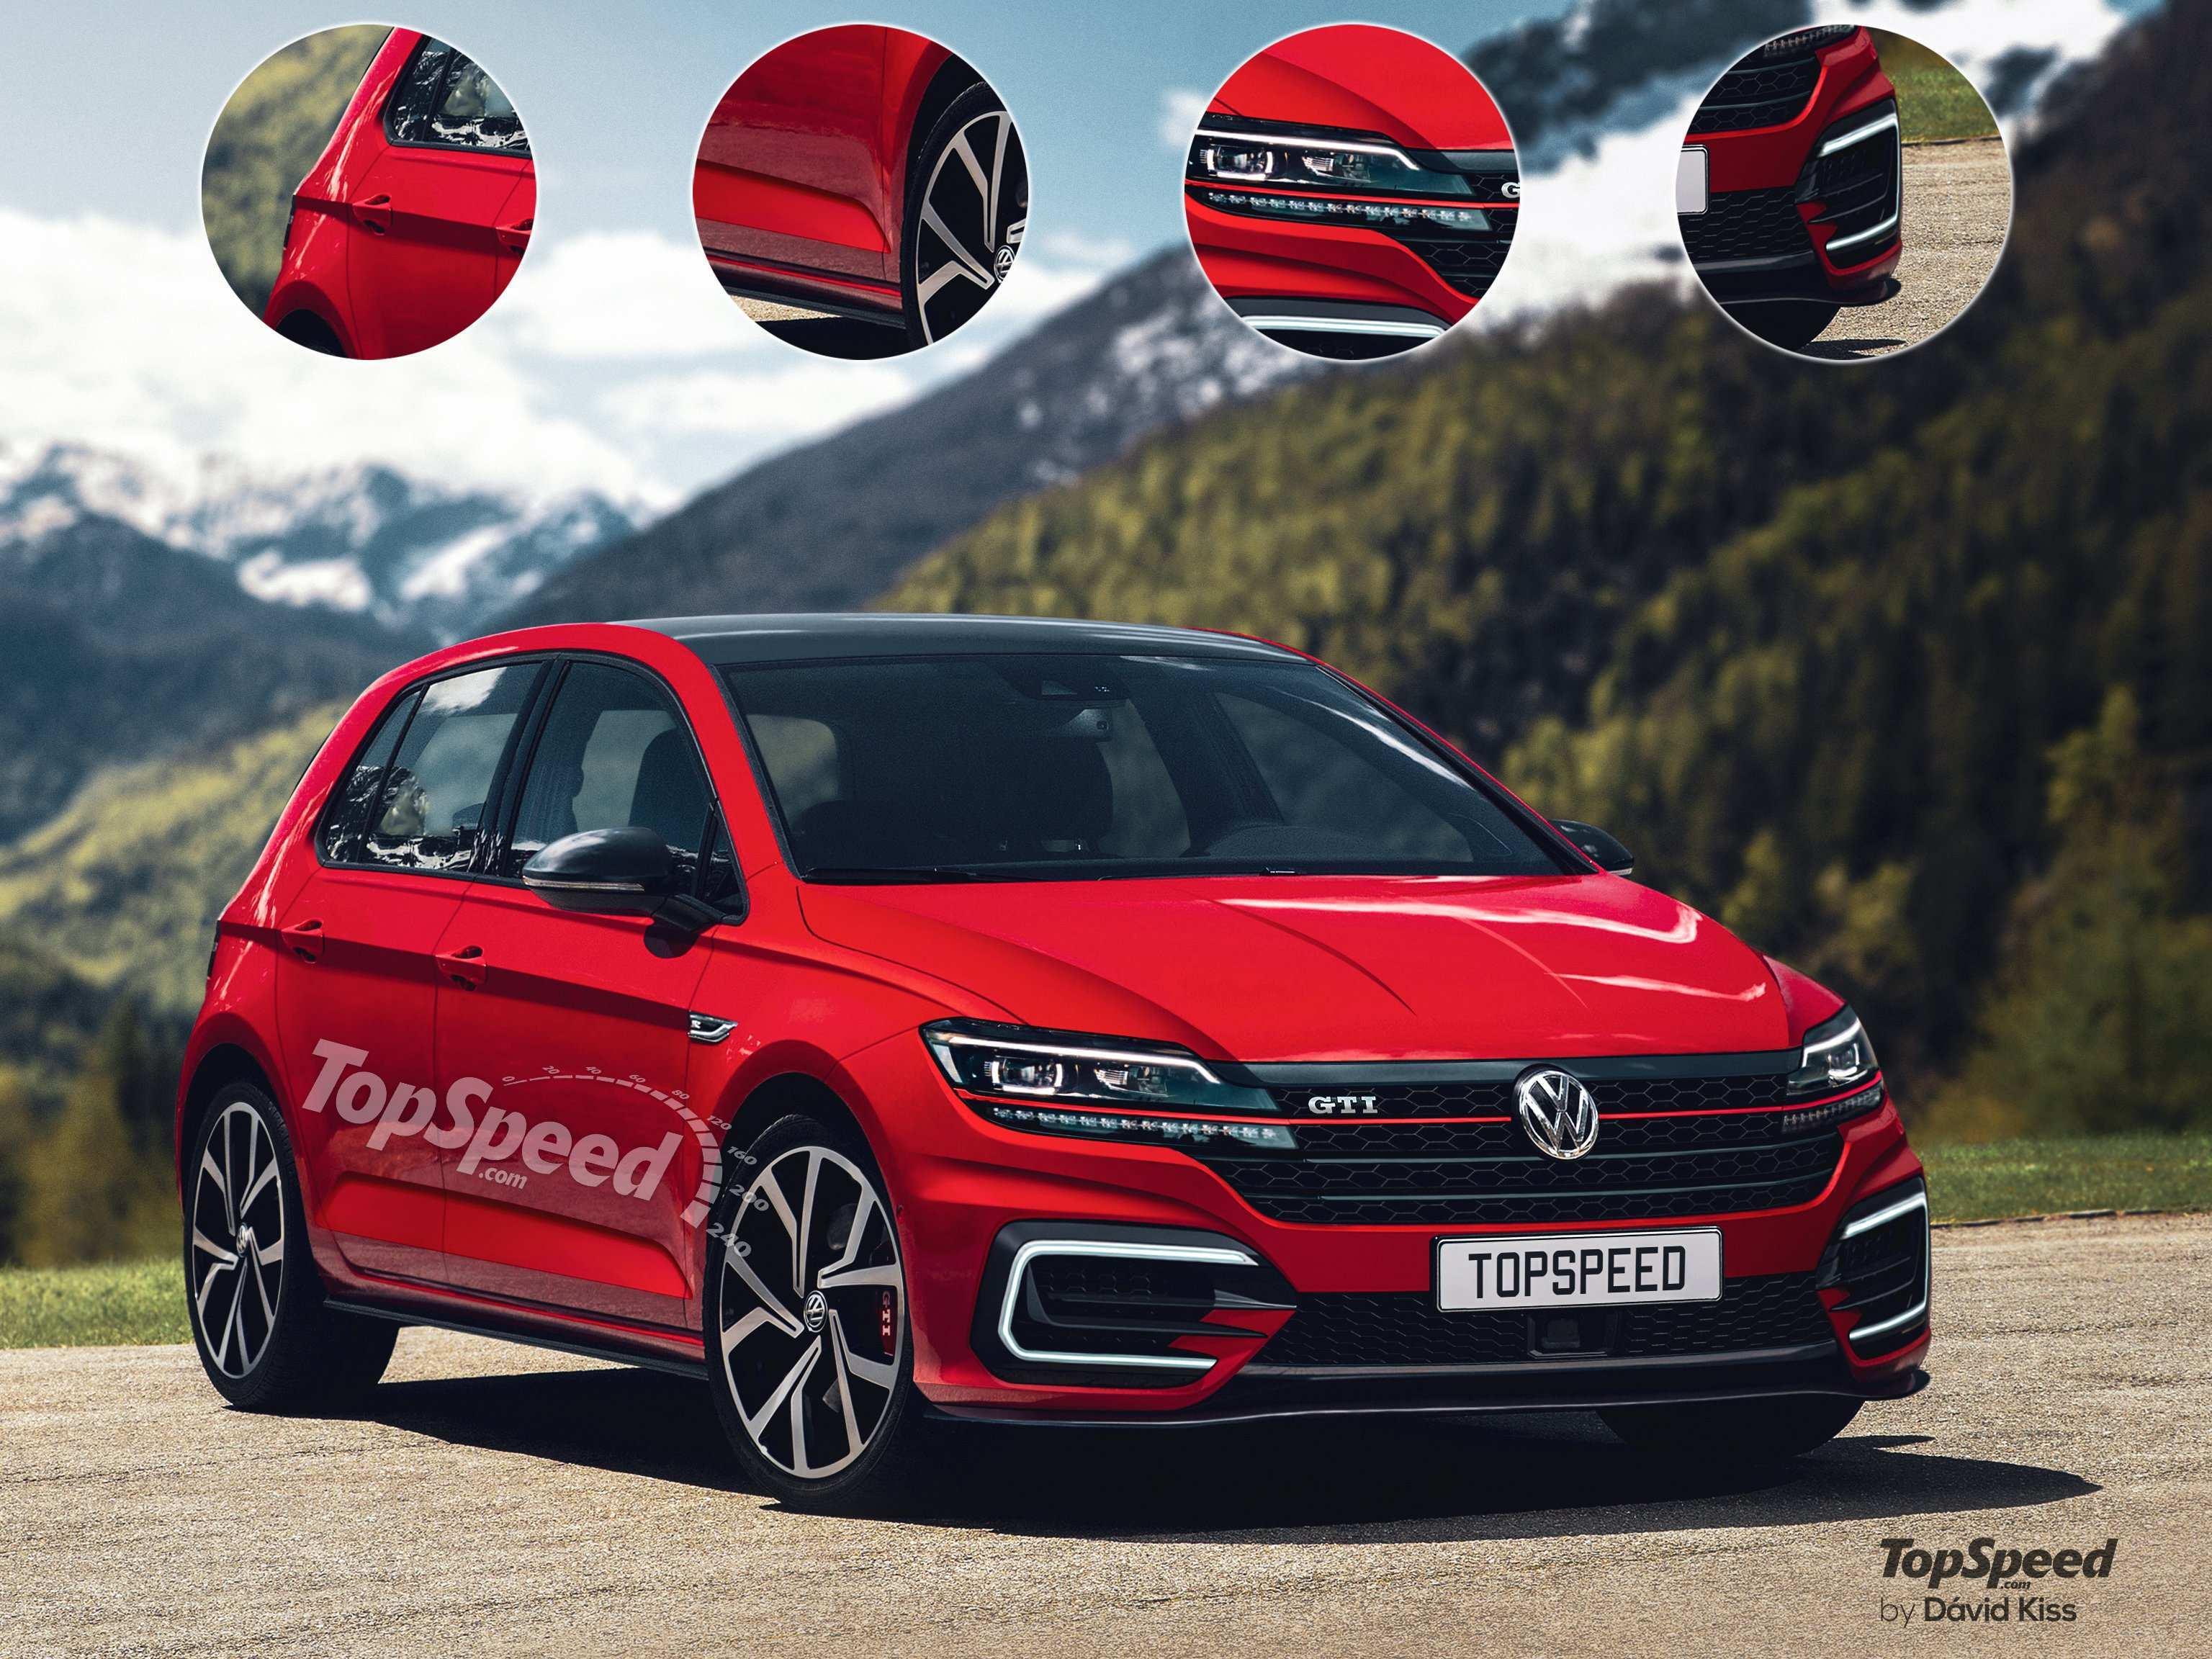 17 Great 2020 Volkswagen Golf R Exterior and Interior for 2020 Volkswagen Golf R